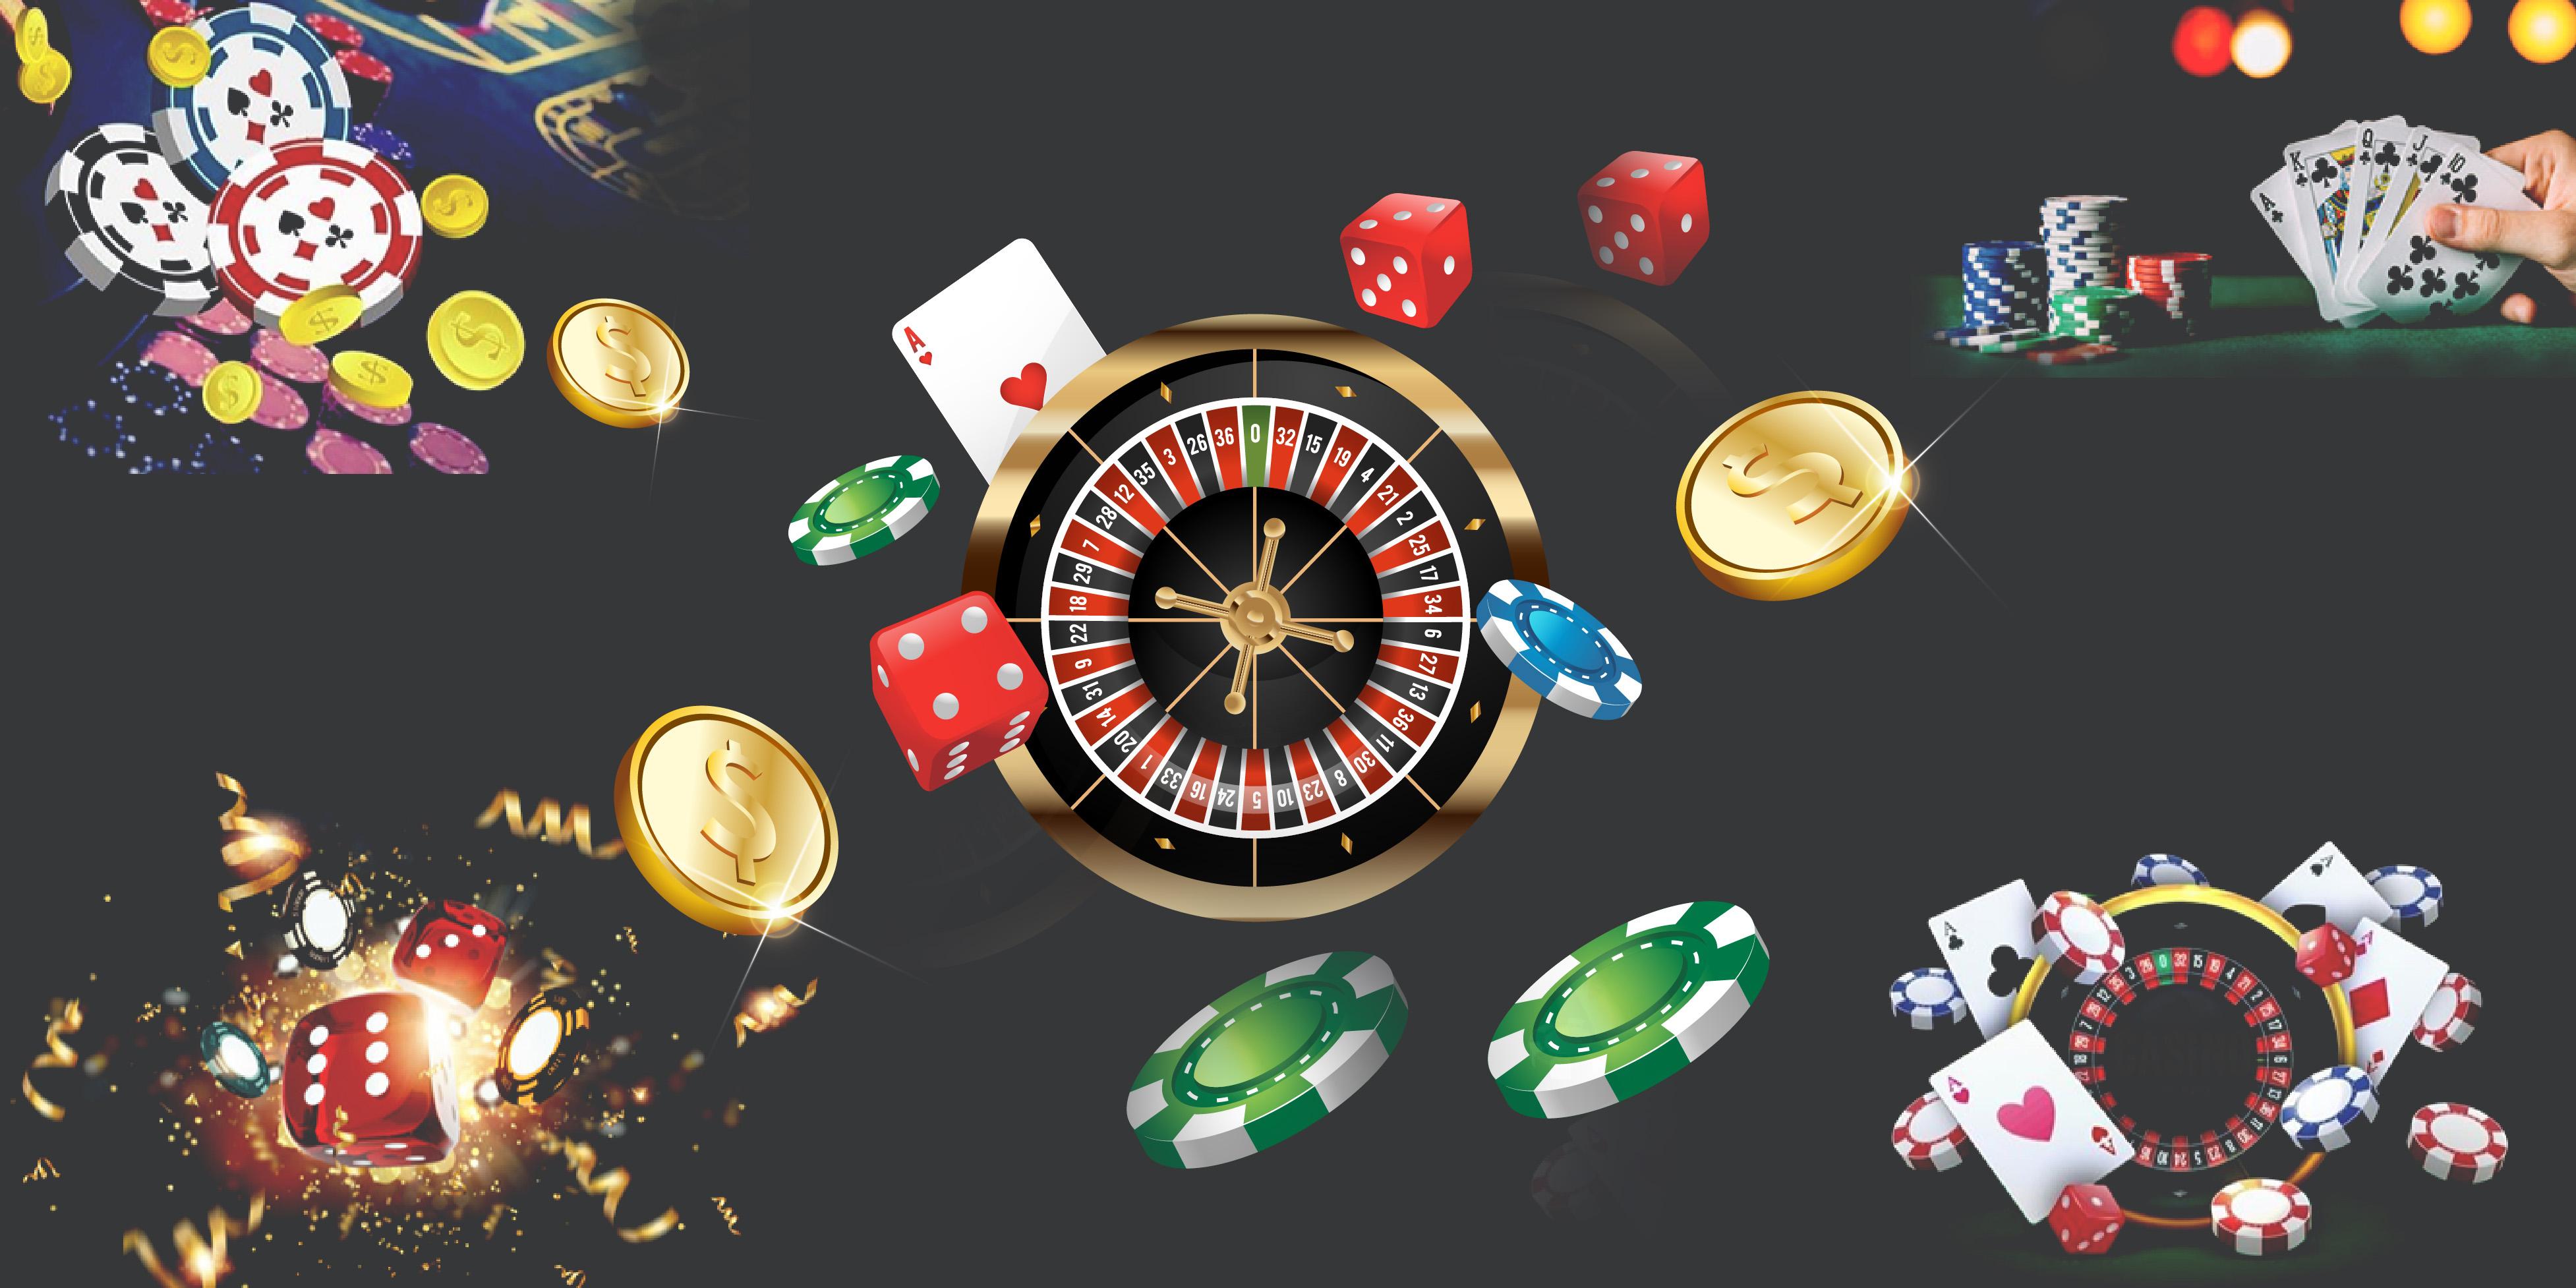 Make 99,  Situs Judi,  Agen Judi Bola,  Poker,  Gambling,  Casino,  Sports & Betting Dofollow PBN